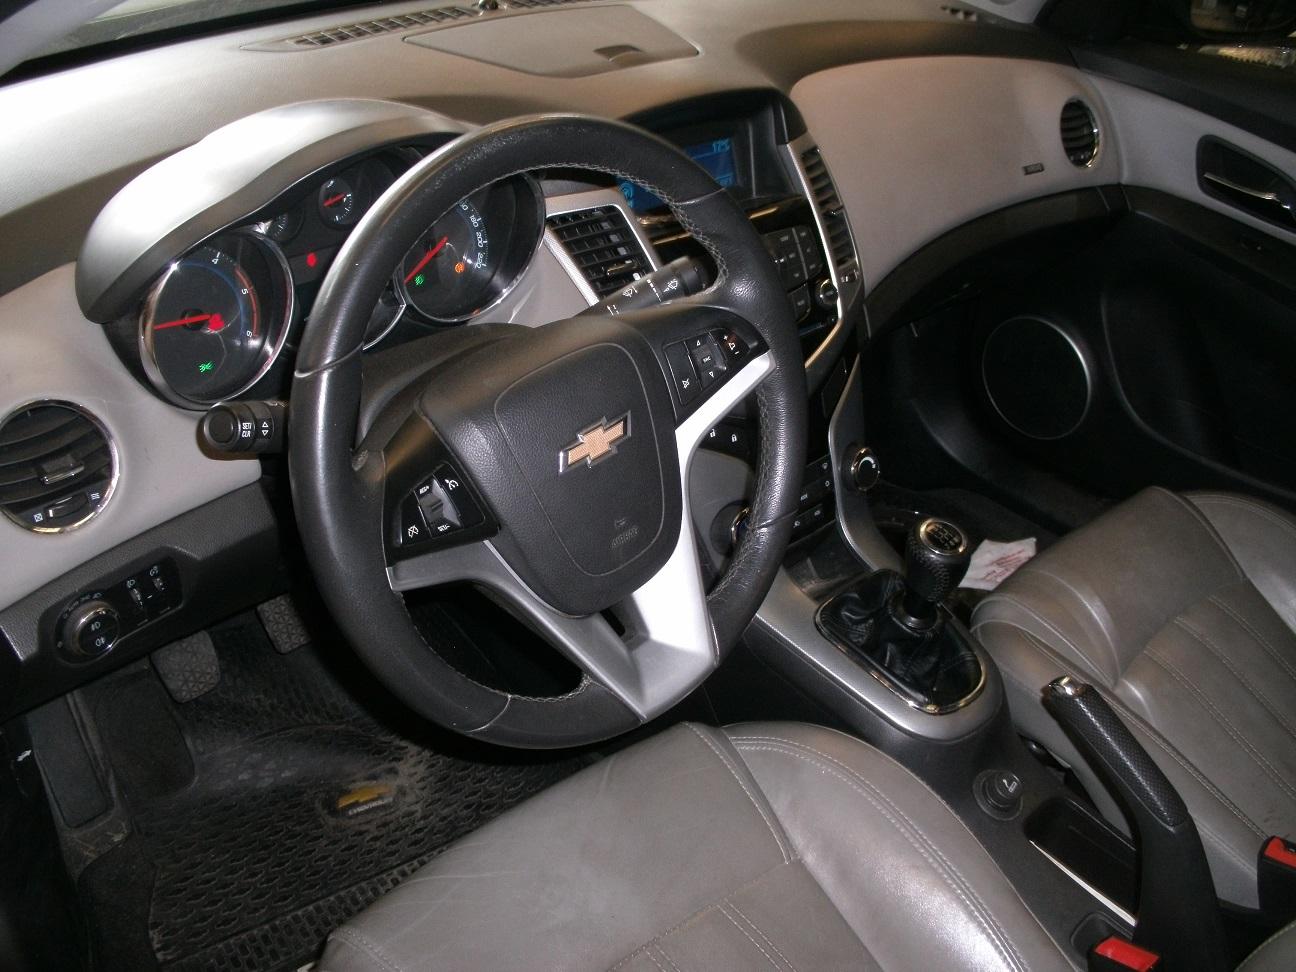 2011 Chevrolet Cruze LTZ 2.0 L